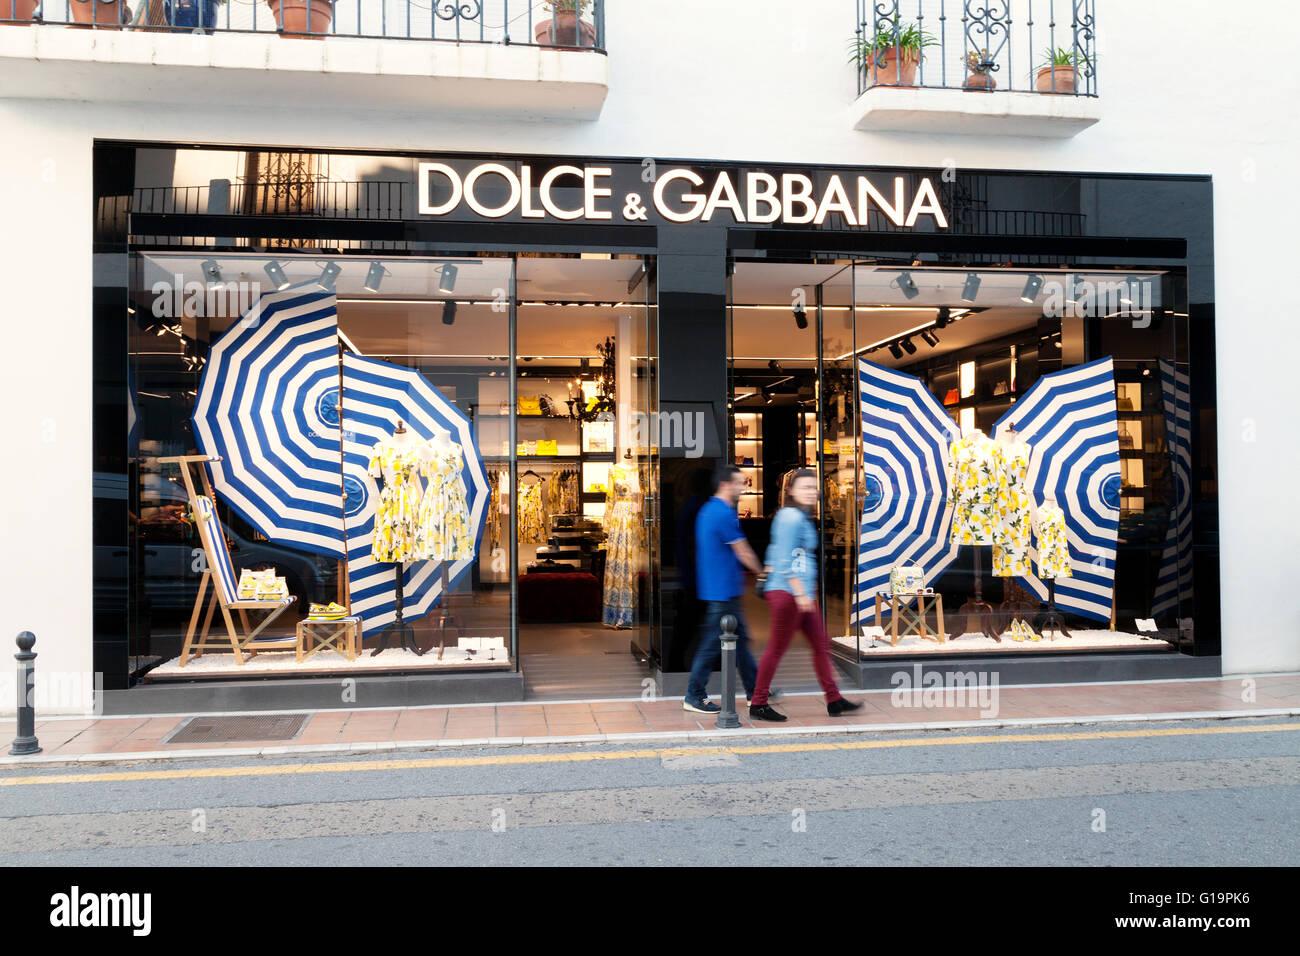 Dolce & Gabbana store exterior, Puerto Banus, Marbella Spain - Stock Image